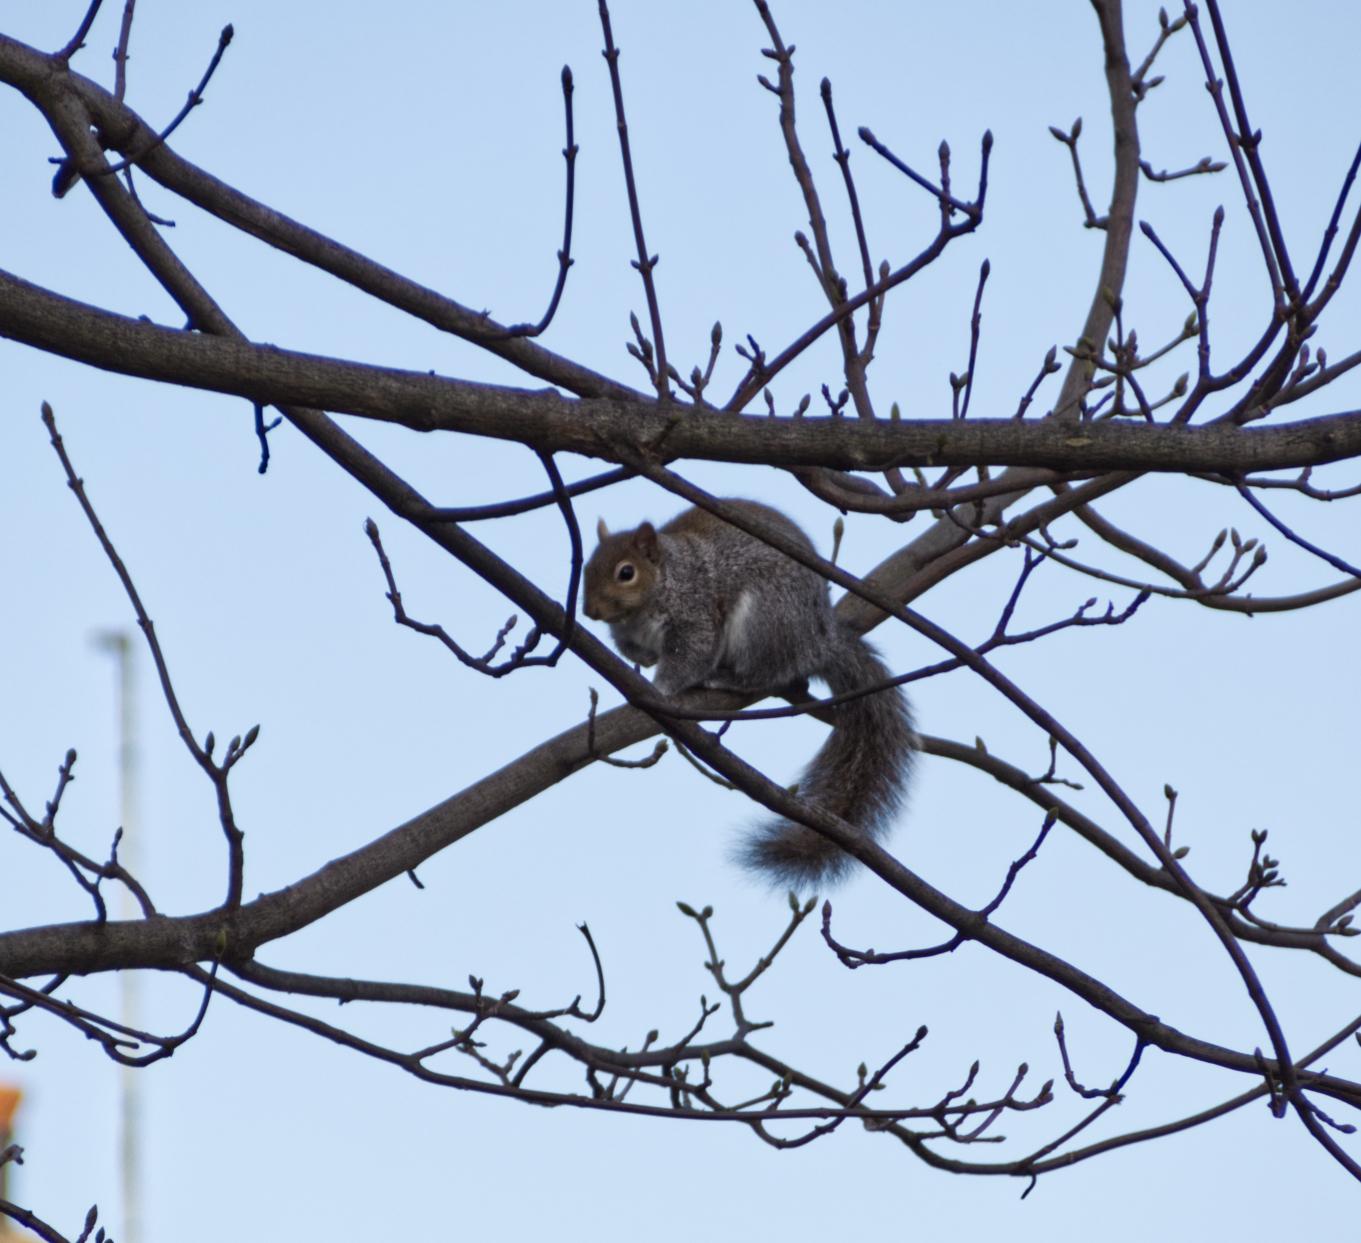 SquirBranch1.jpg